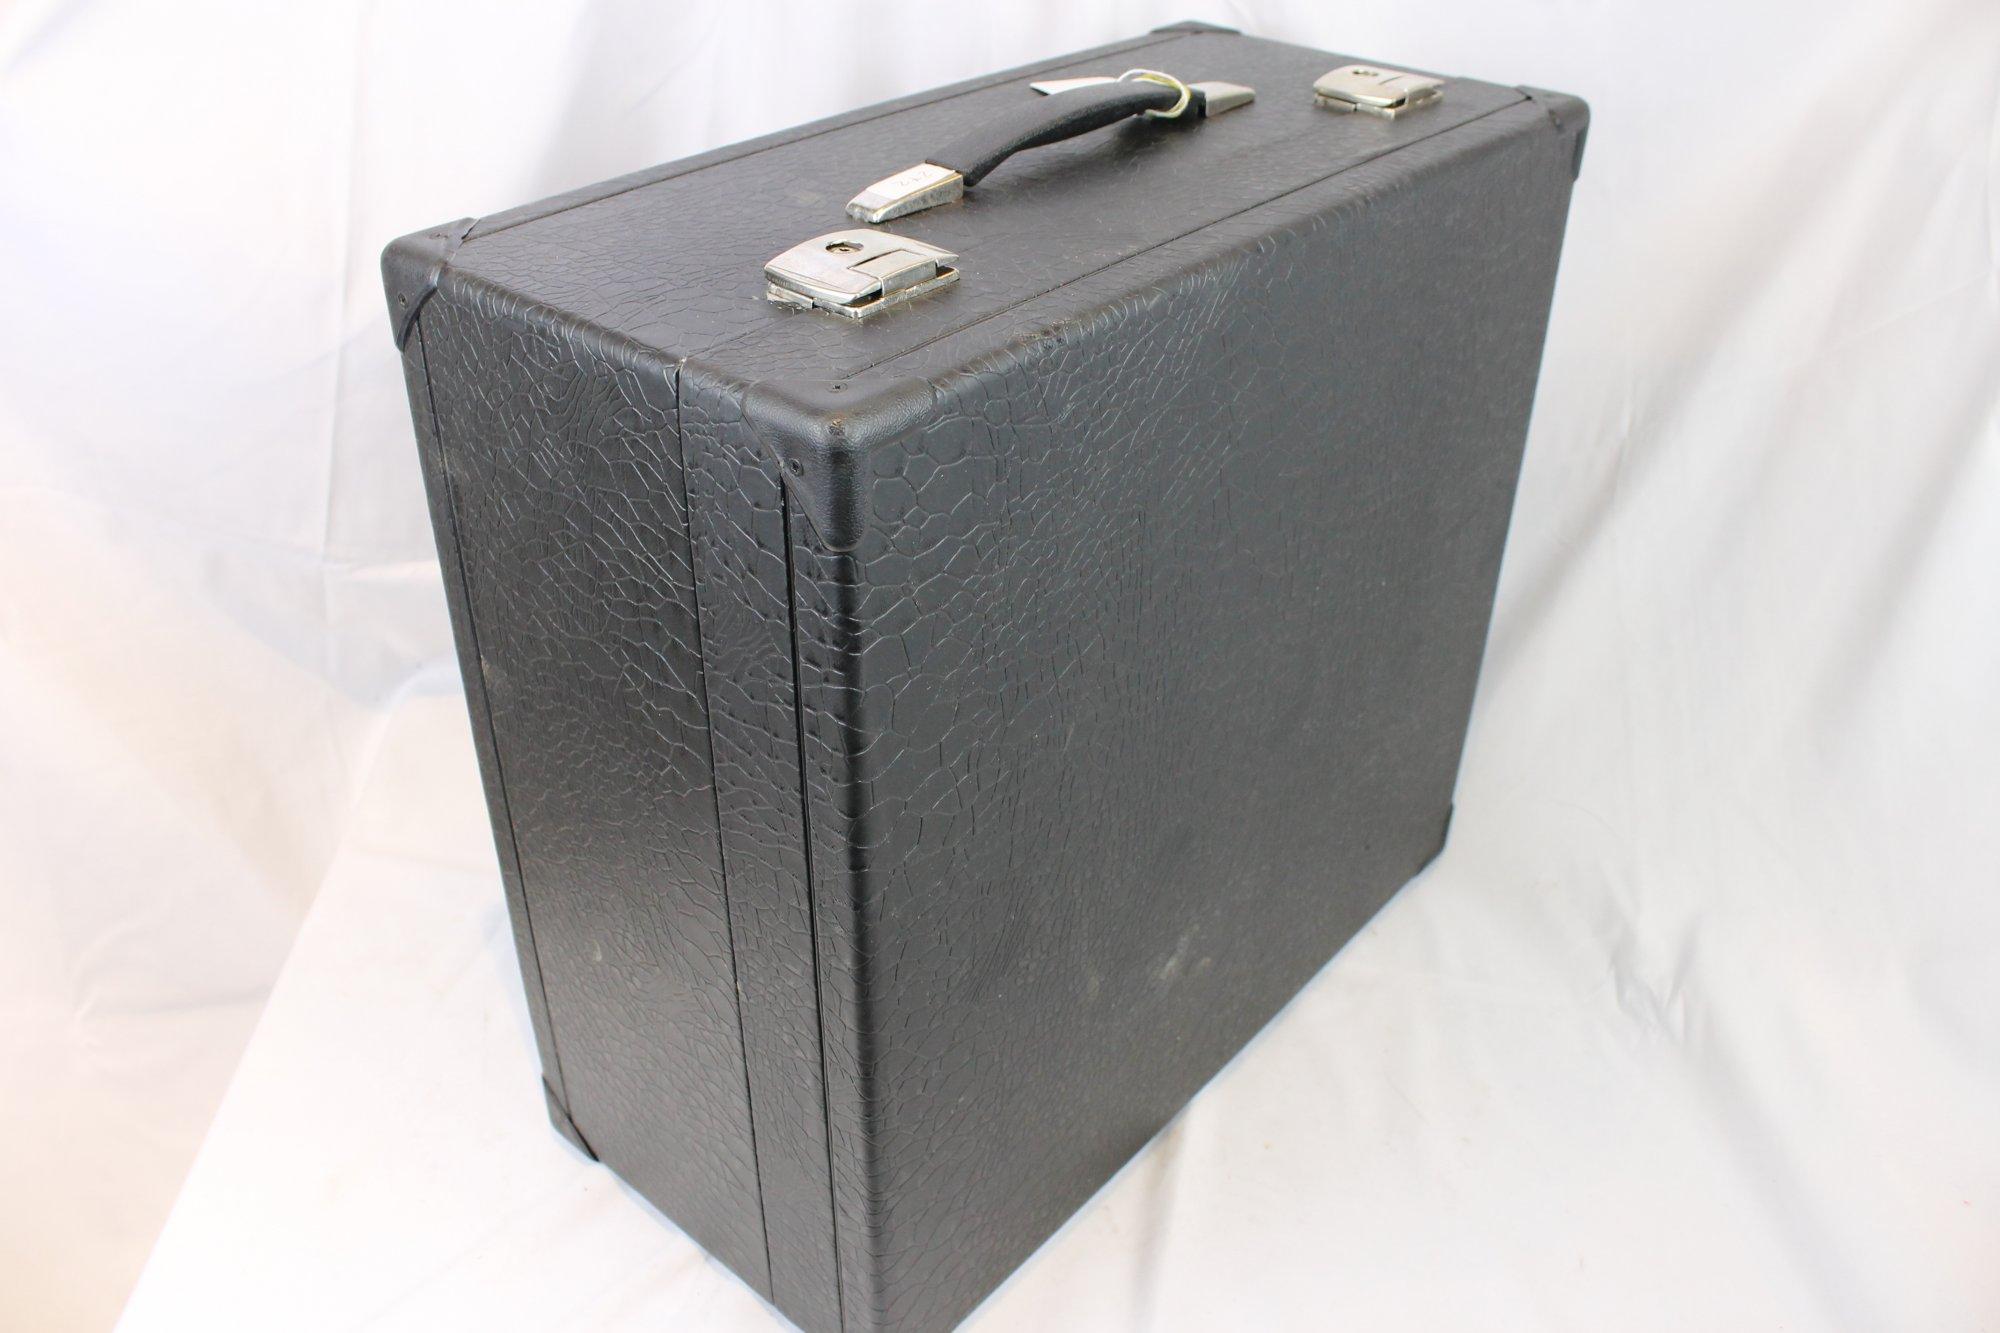 Black Italian Accordion Hard Case 19.25 x 17.75 x 9 (49cm x 45cm x 23cm)